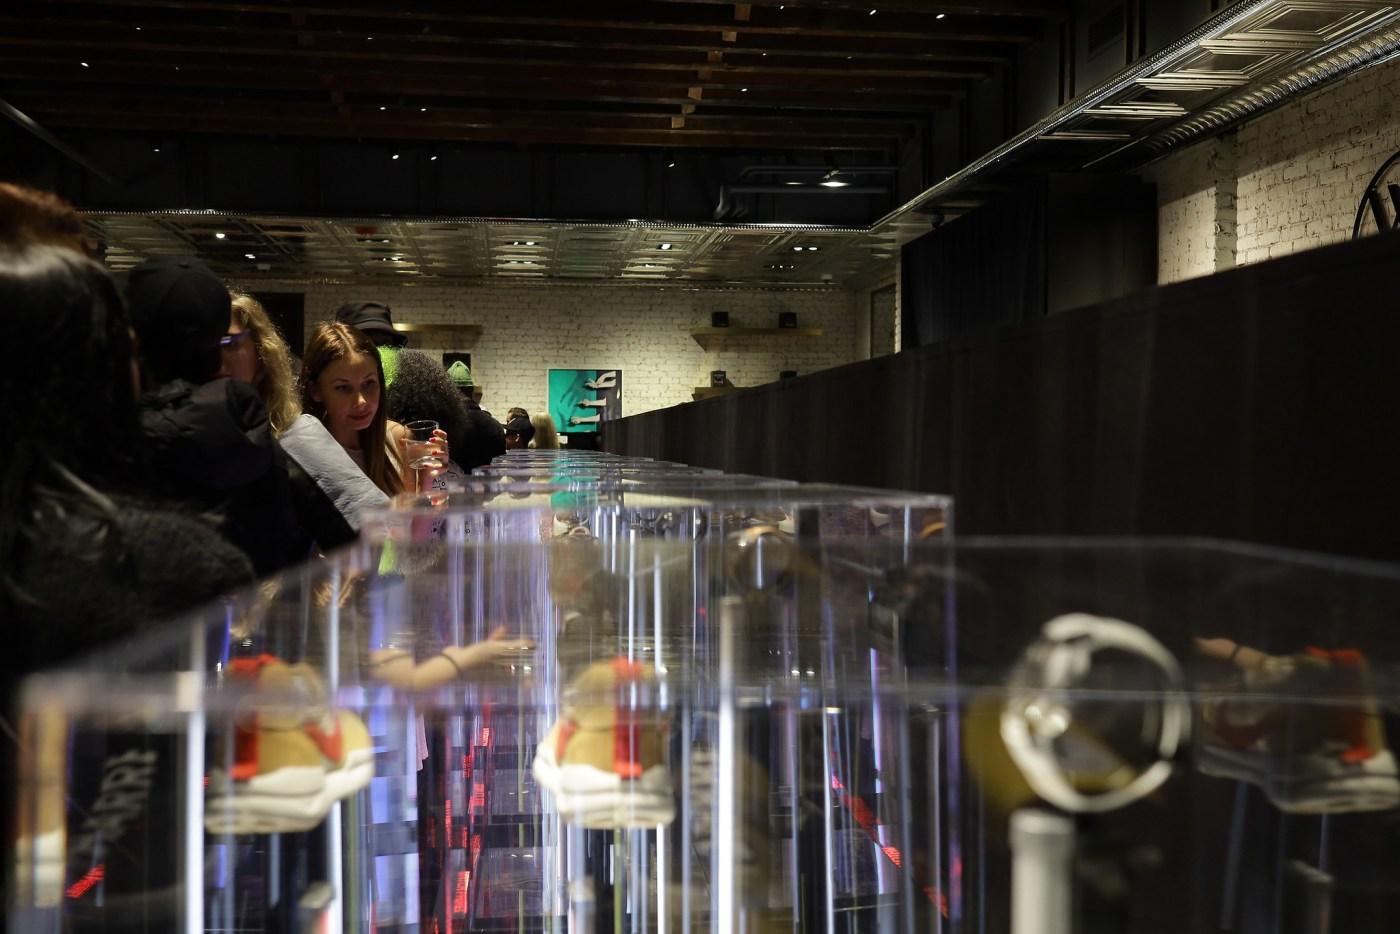 Watches of Switzerland SoHo basement #SneakerTime exhibit